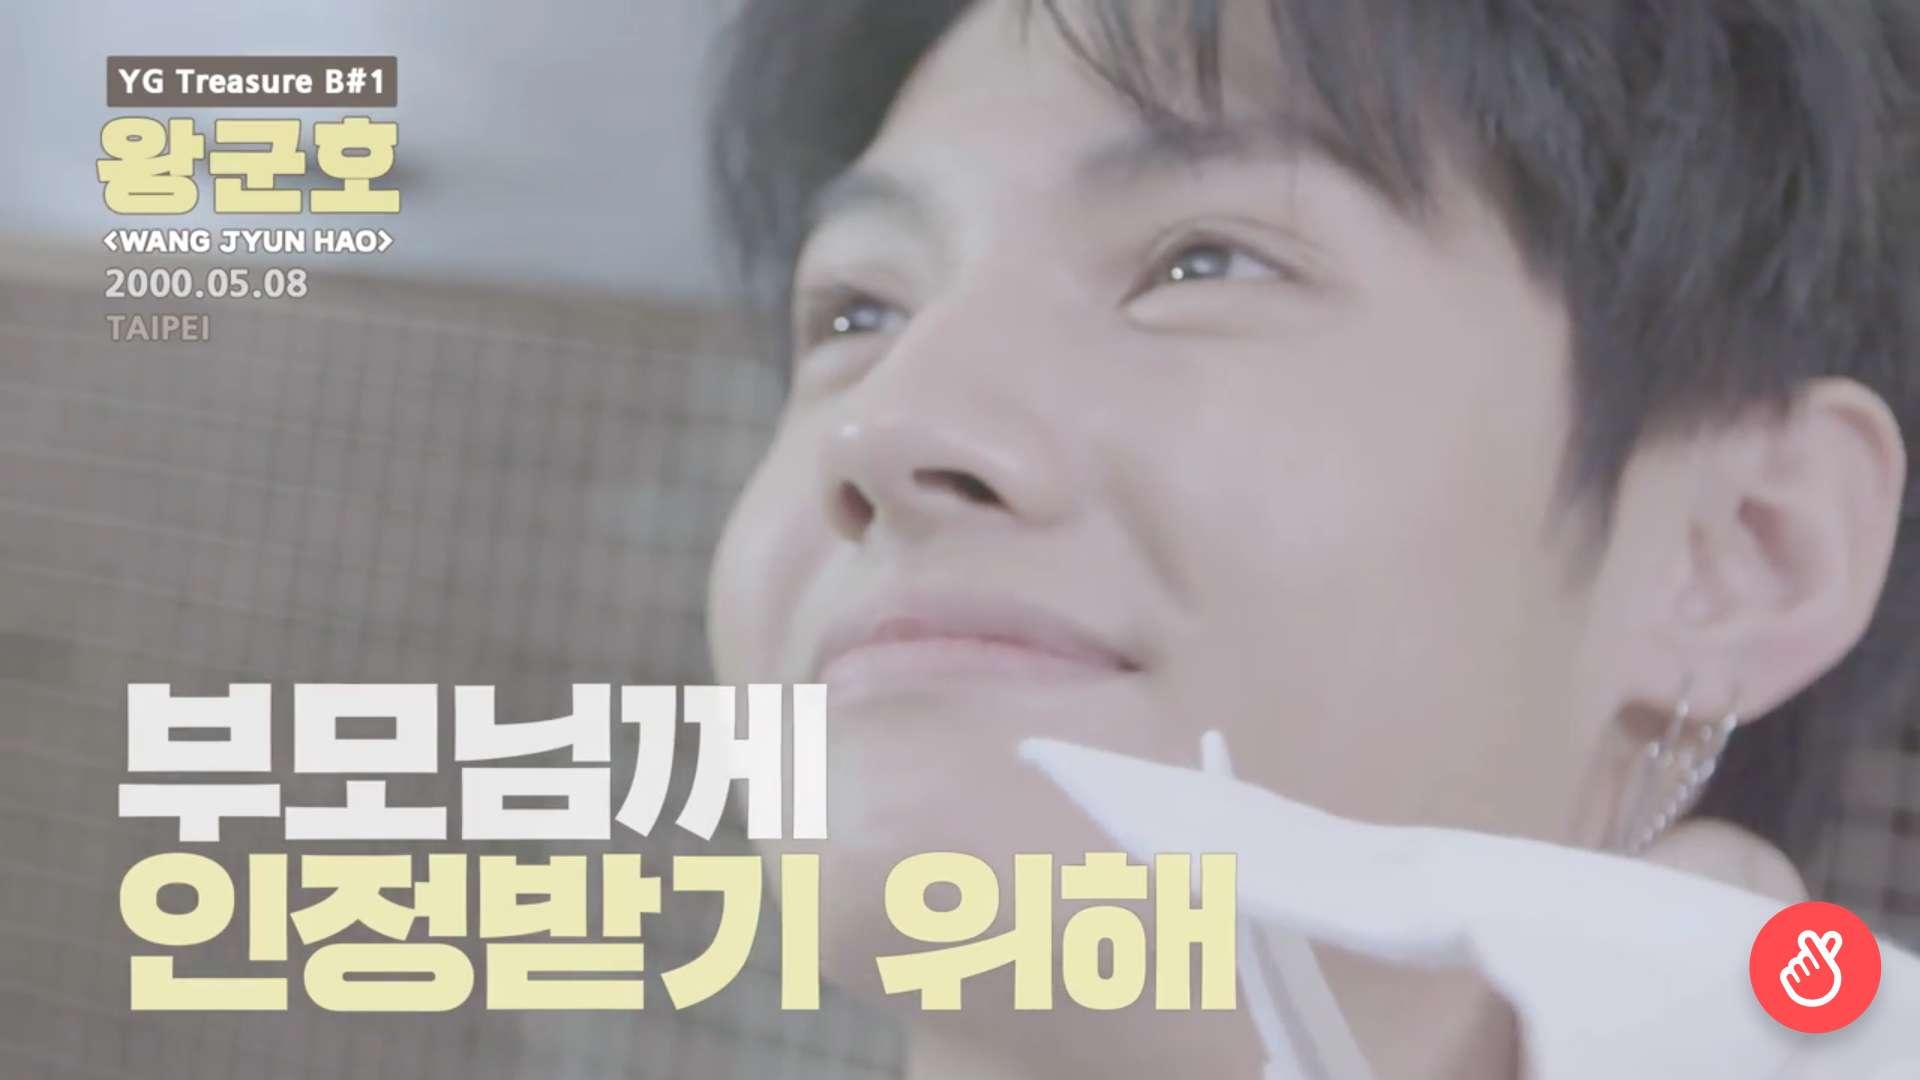 Wang Jyun Hao也說了自己希望能順利出道來證明自己的實力給父母看!努力為了自己的夢想奮鬥的樣子真的是非常帥氣呢!